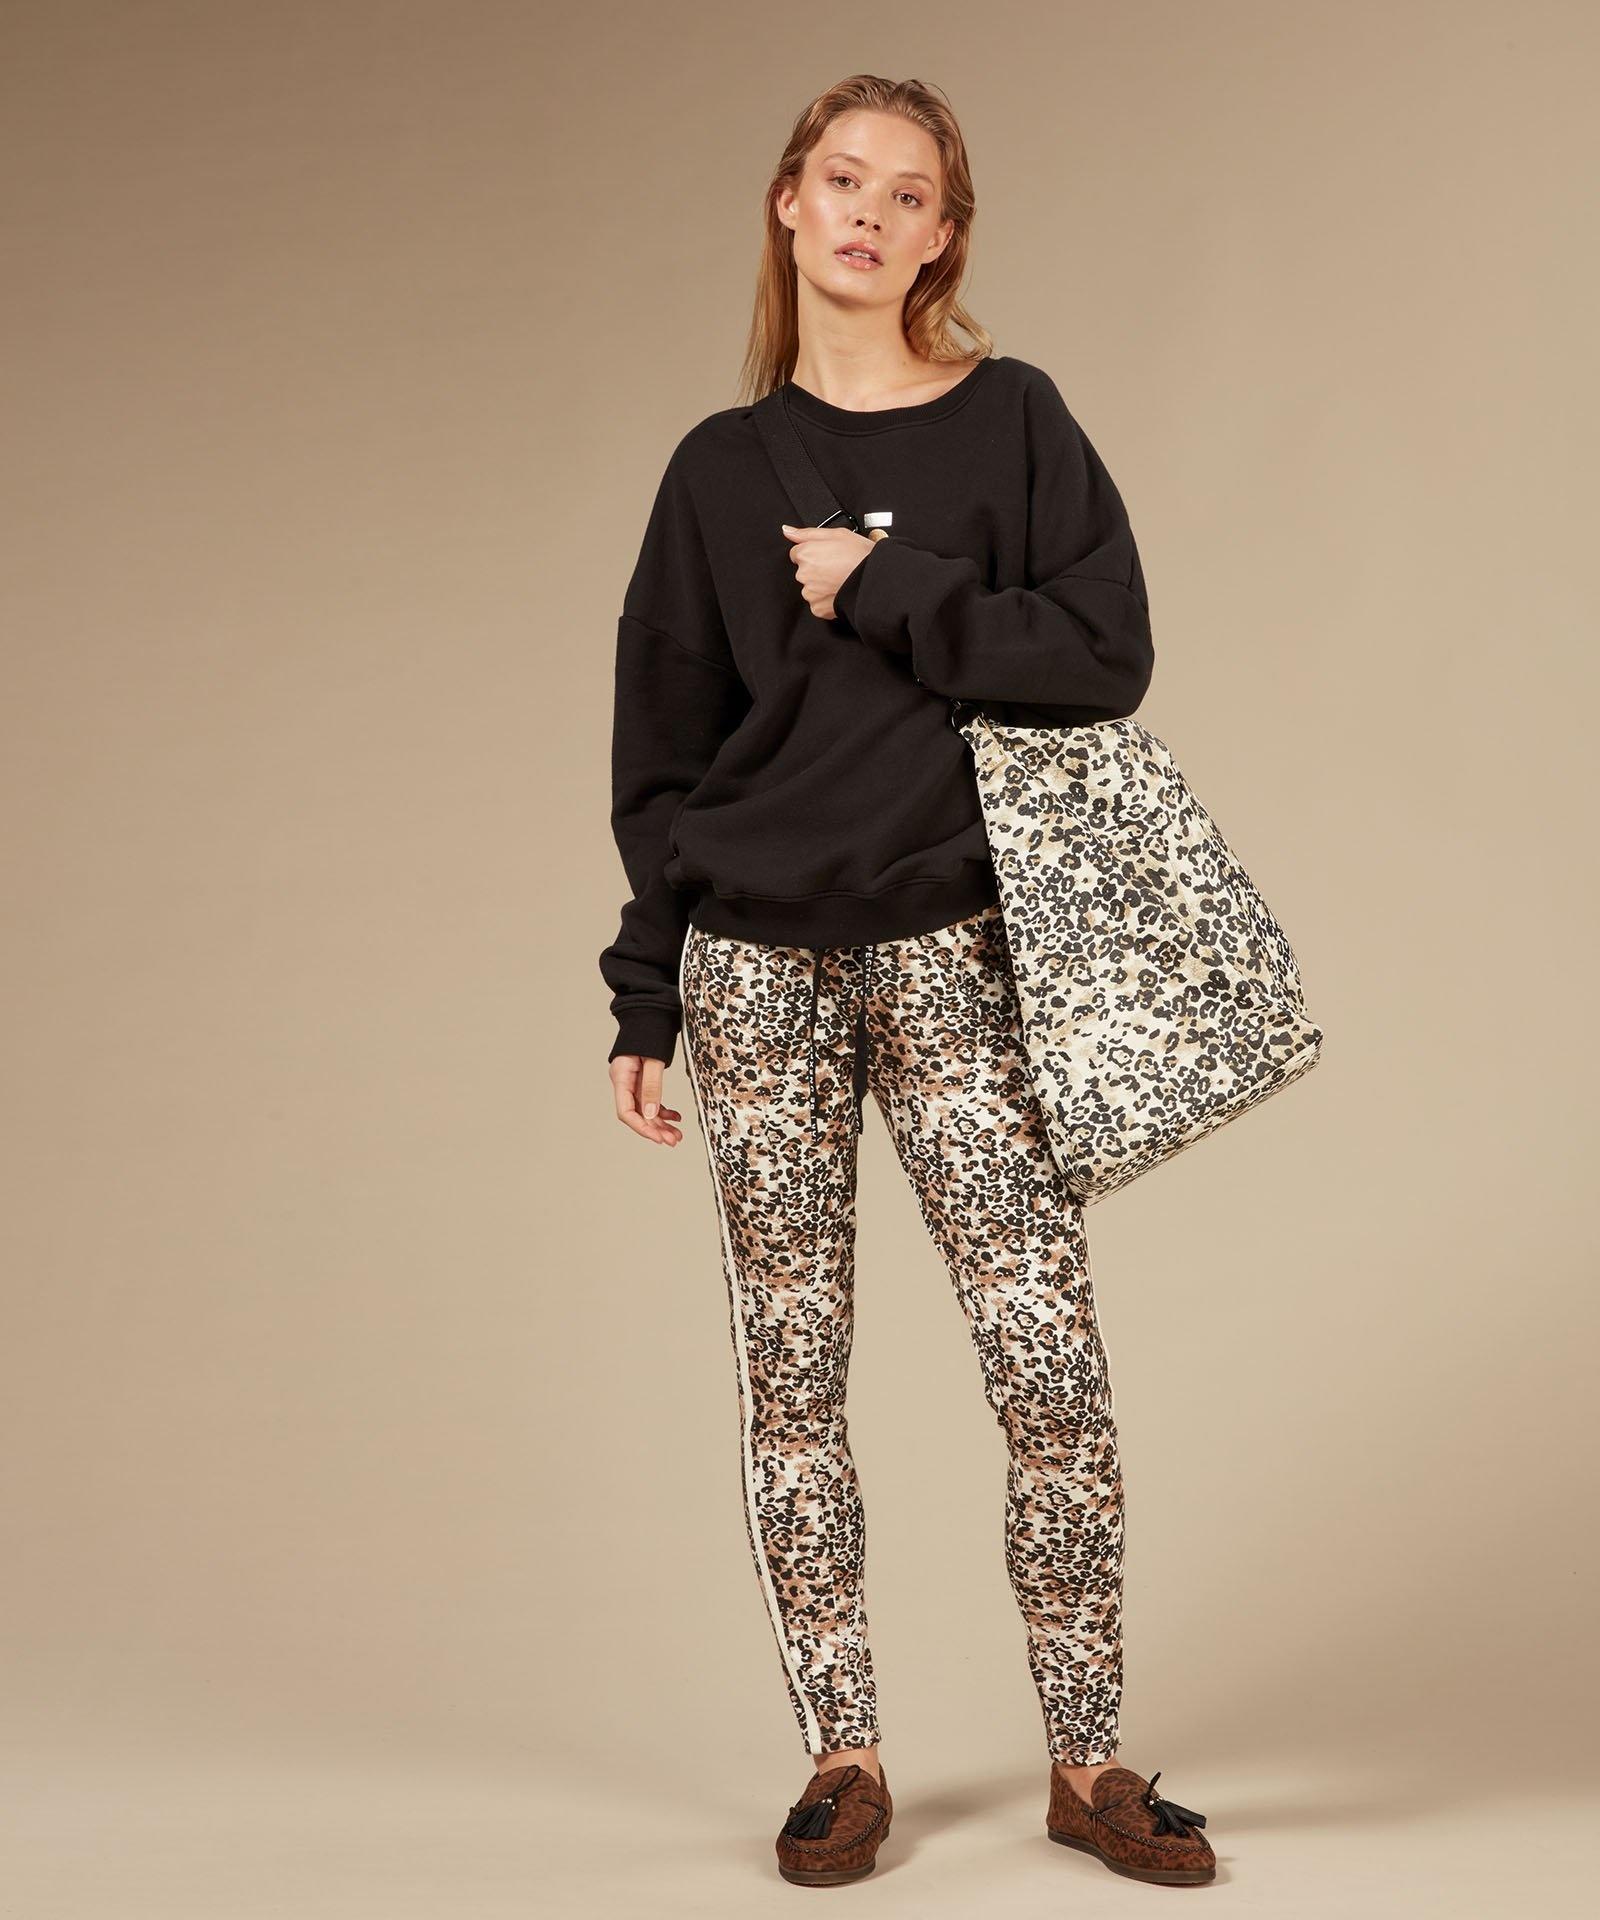 Trui foil print sweater black-5